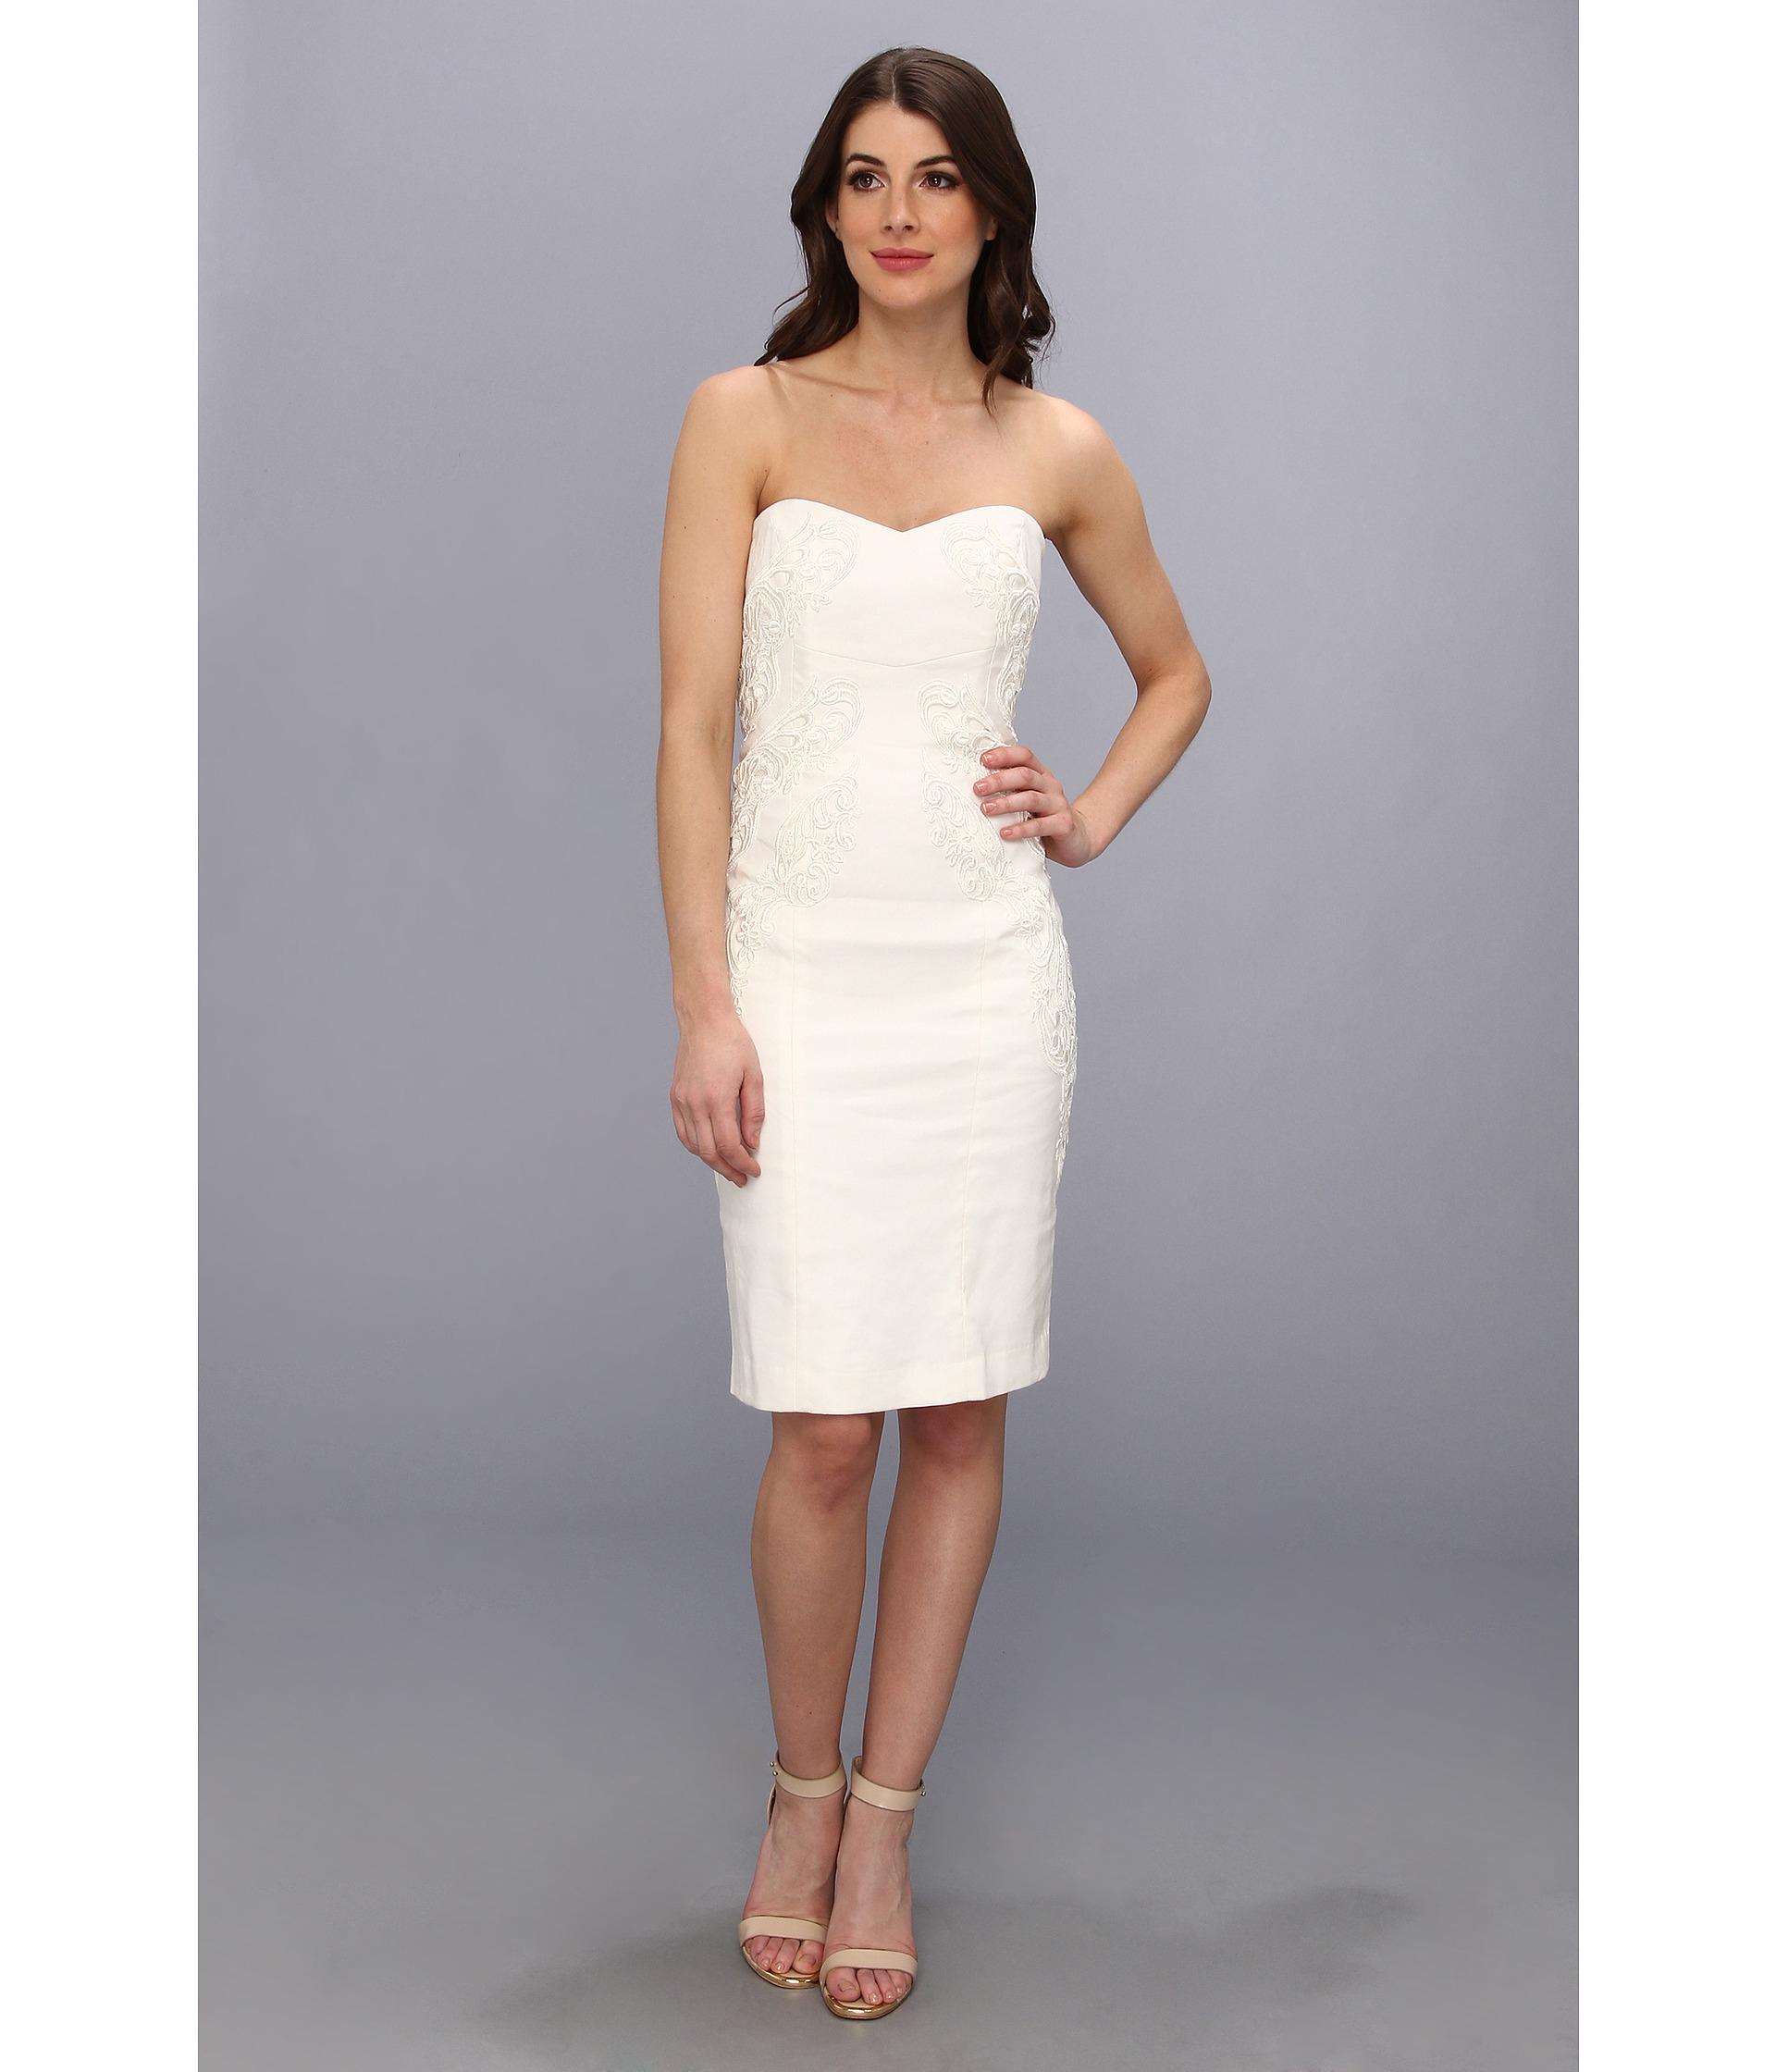 Nicole Miller Evening Dresses Long  Dress images